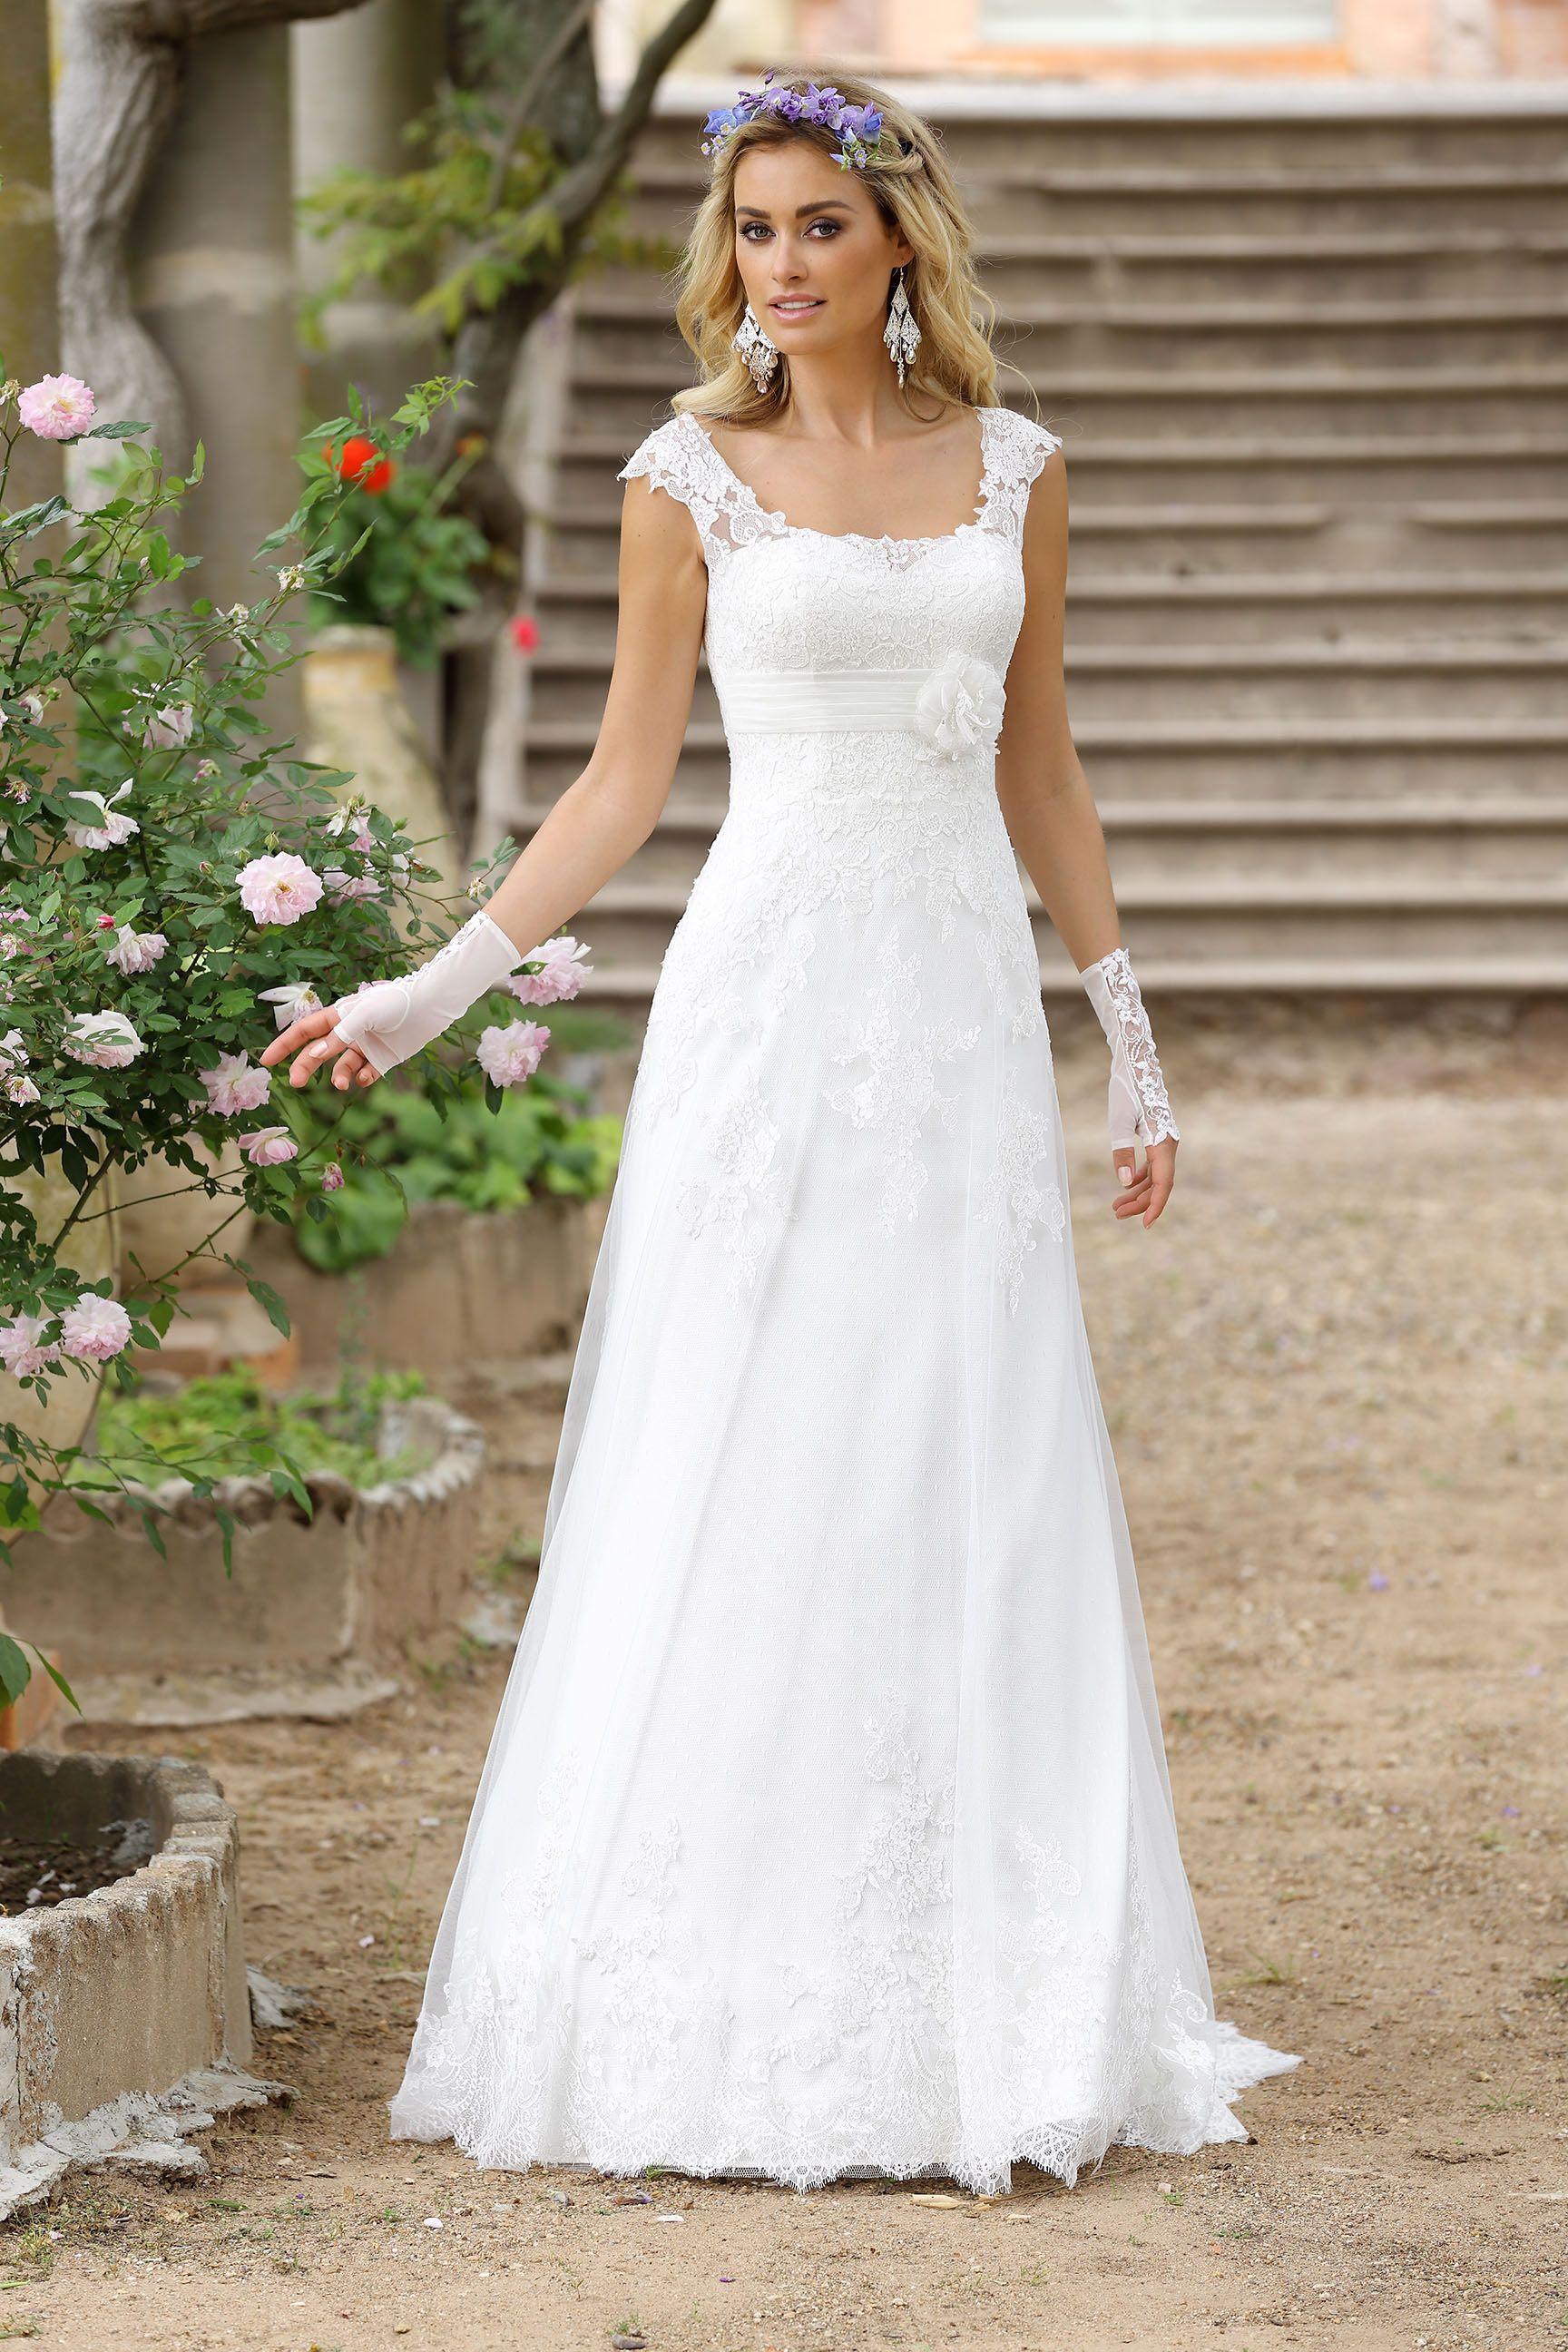 Ladybird Wedding Dress 416001 | Wedding dresses and ideas ...